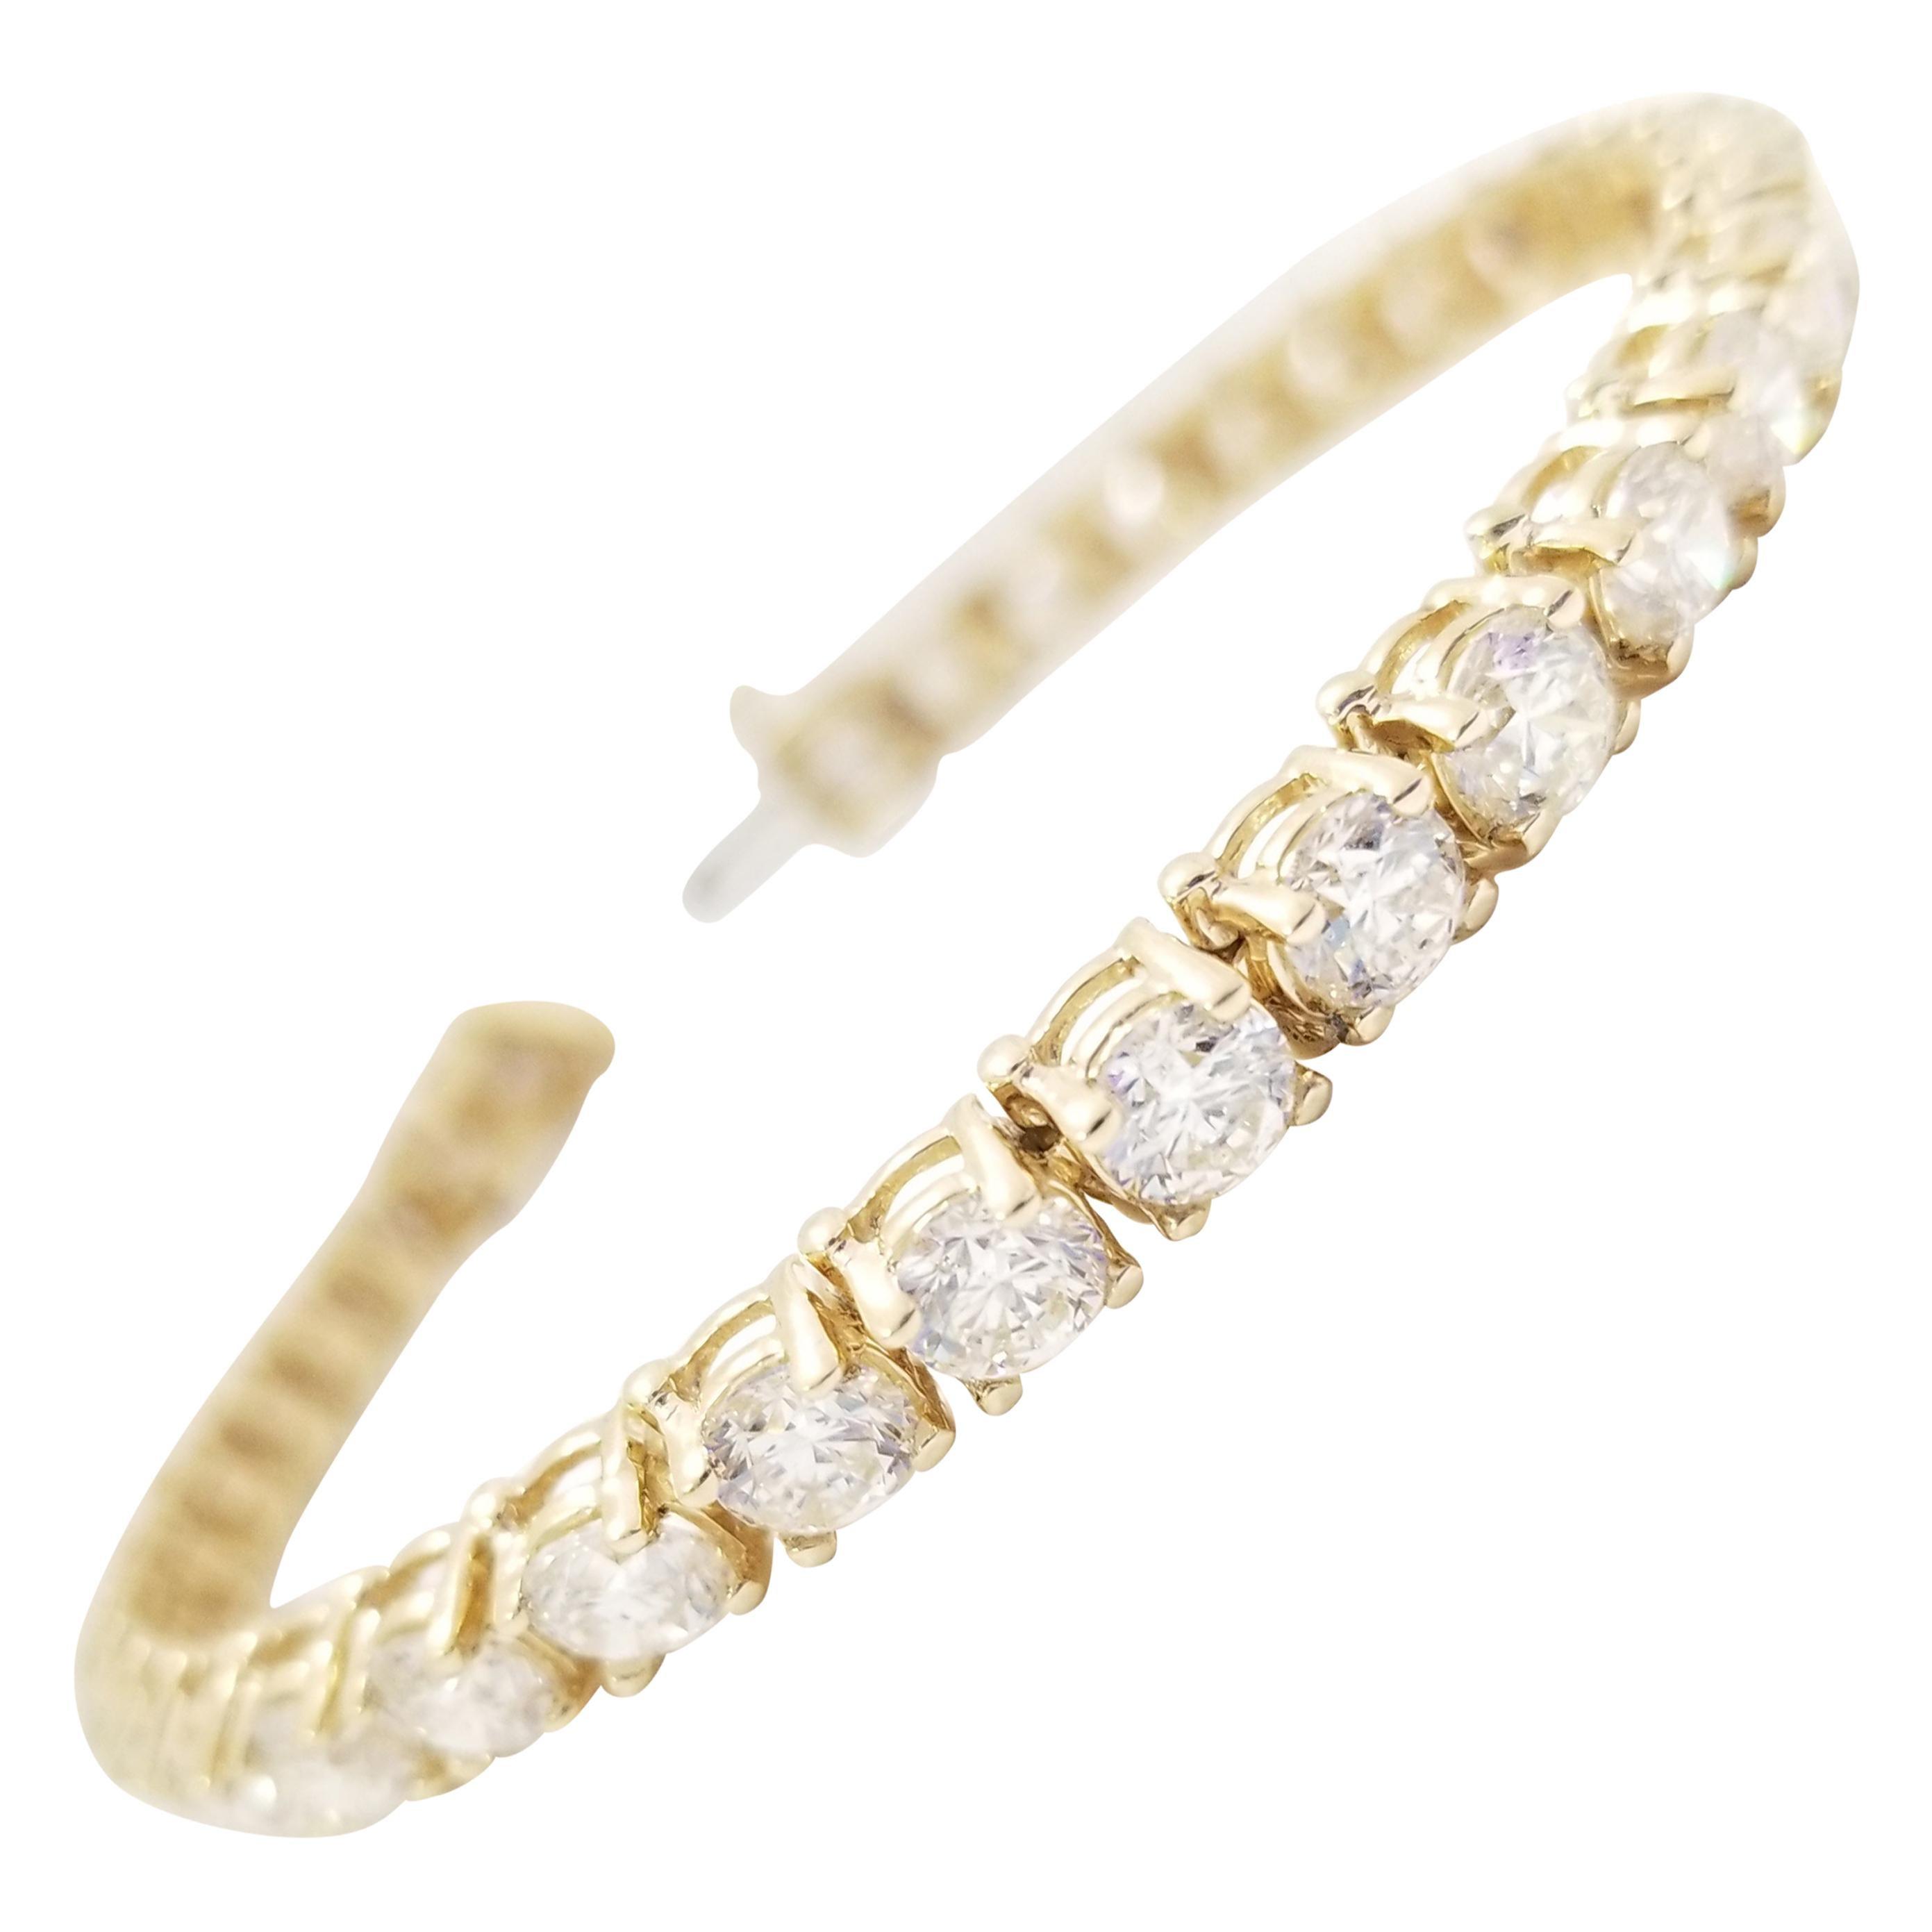 13.21 Carat Round Brilliant Natural Diamond Tennis Bracelet 14 Karat Yellow Gold